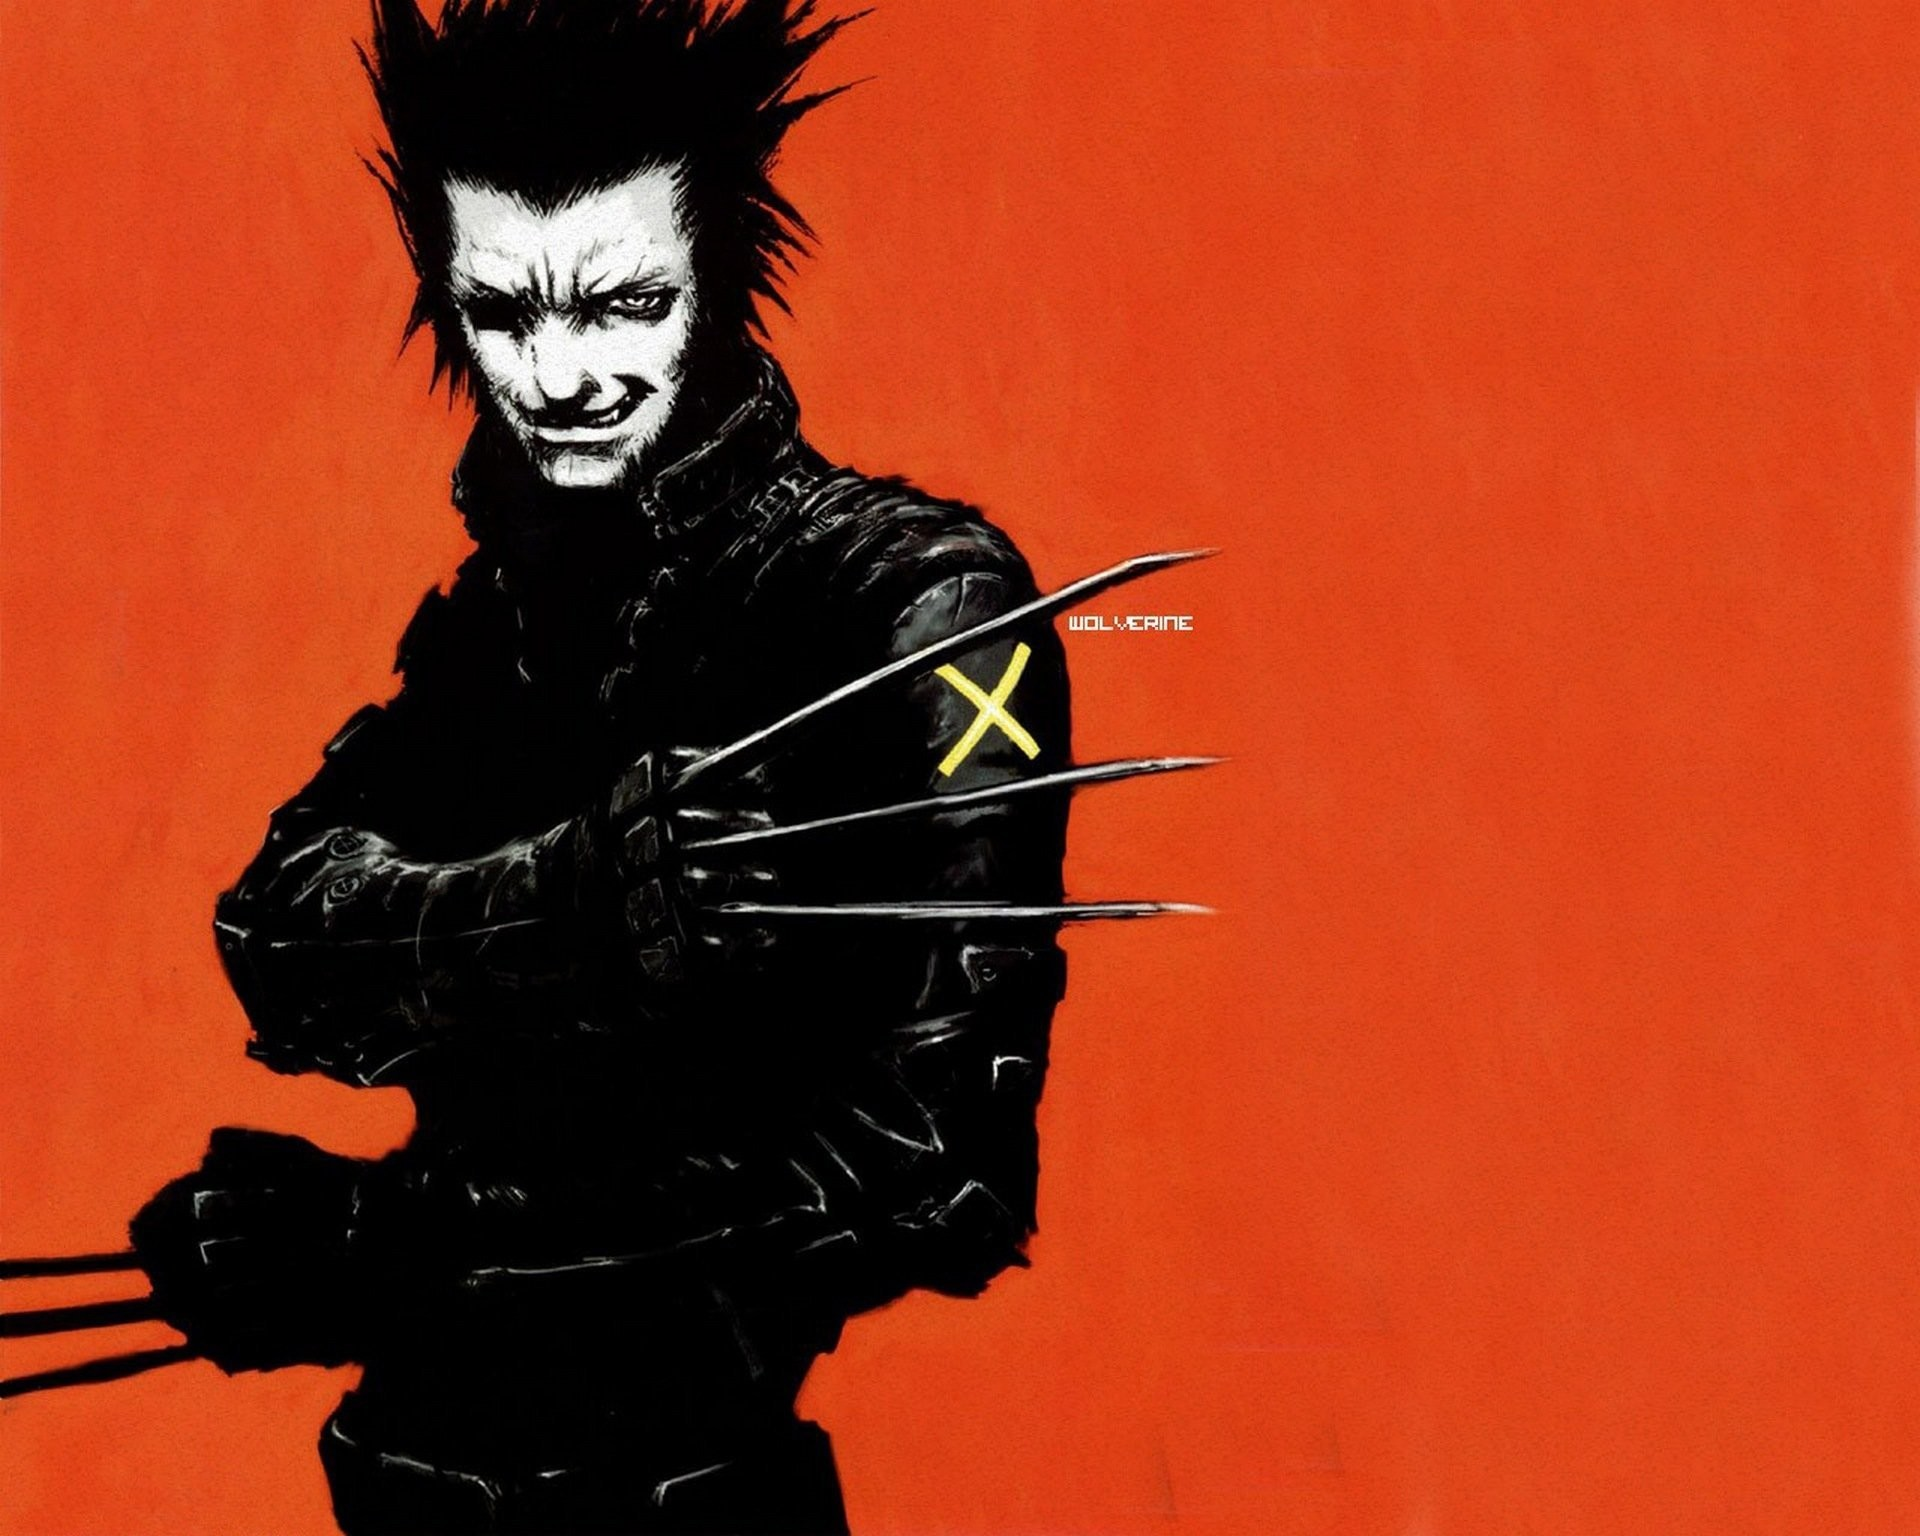 x-men wolverine art marvel comics wolverine: snikt! tsutomu nihei